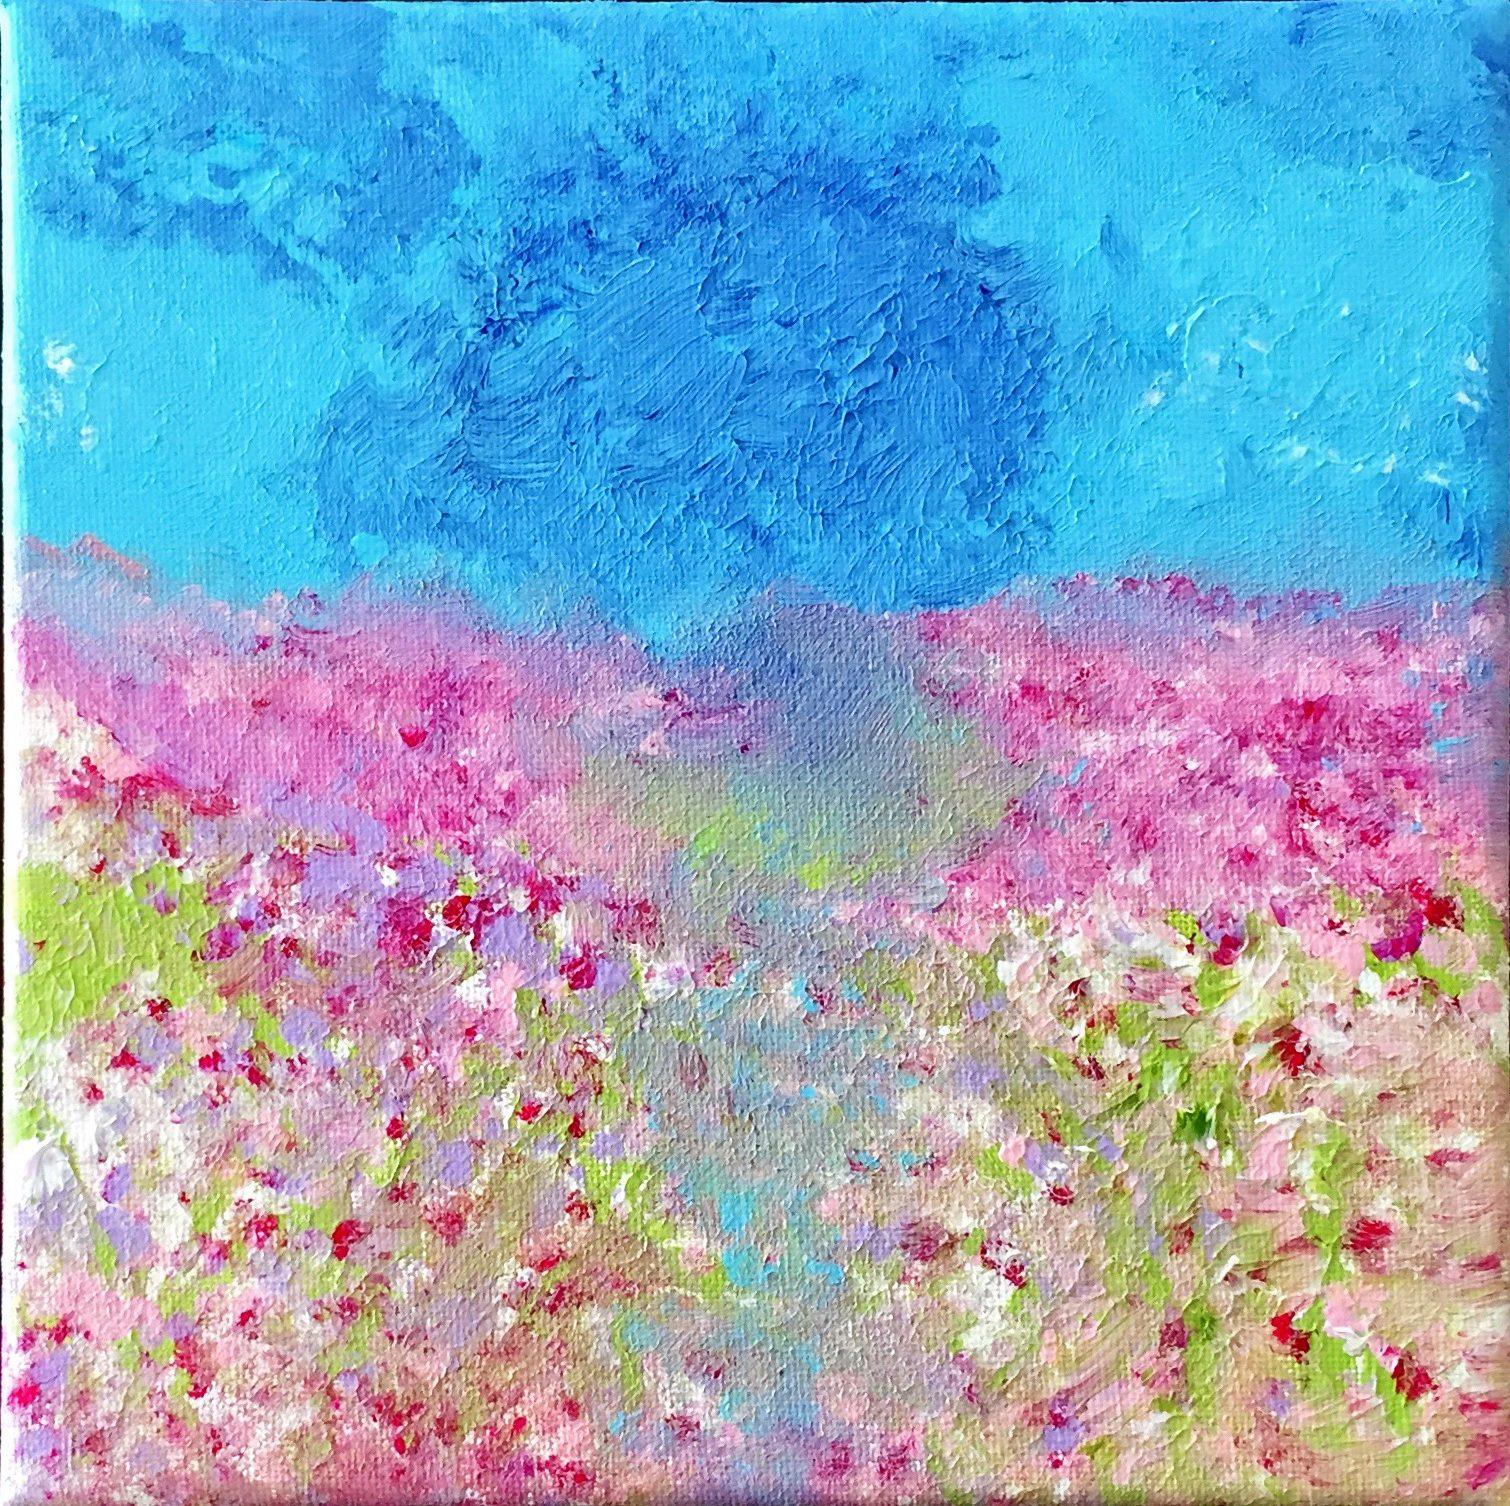 Bild Malerei Kunstwerk SoulArtist Julia Merkt Blumenmeer Blumenwiese